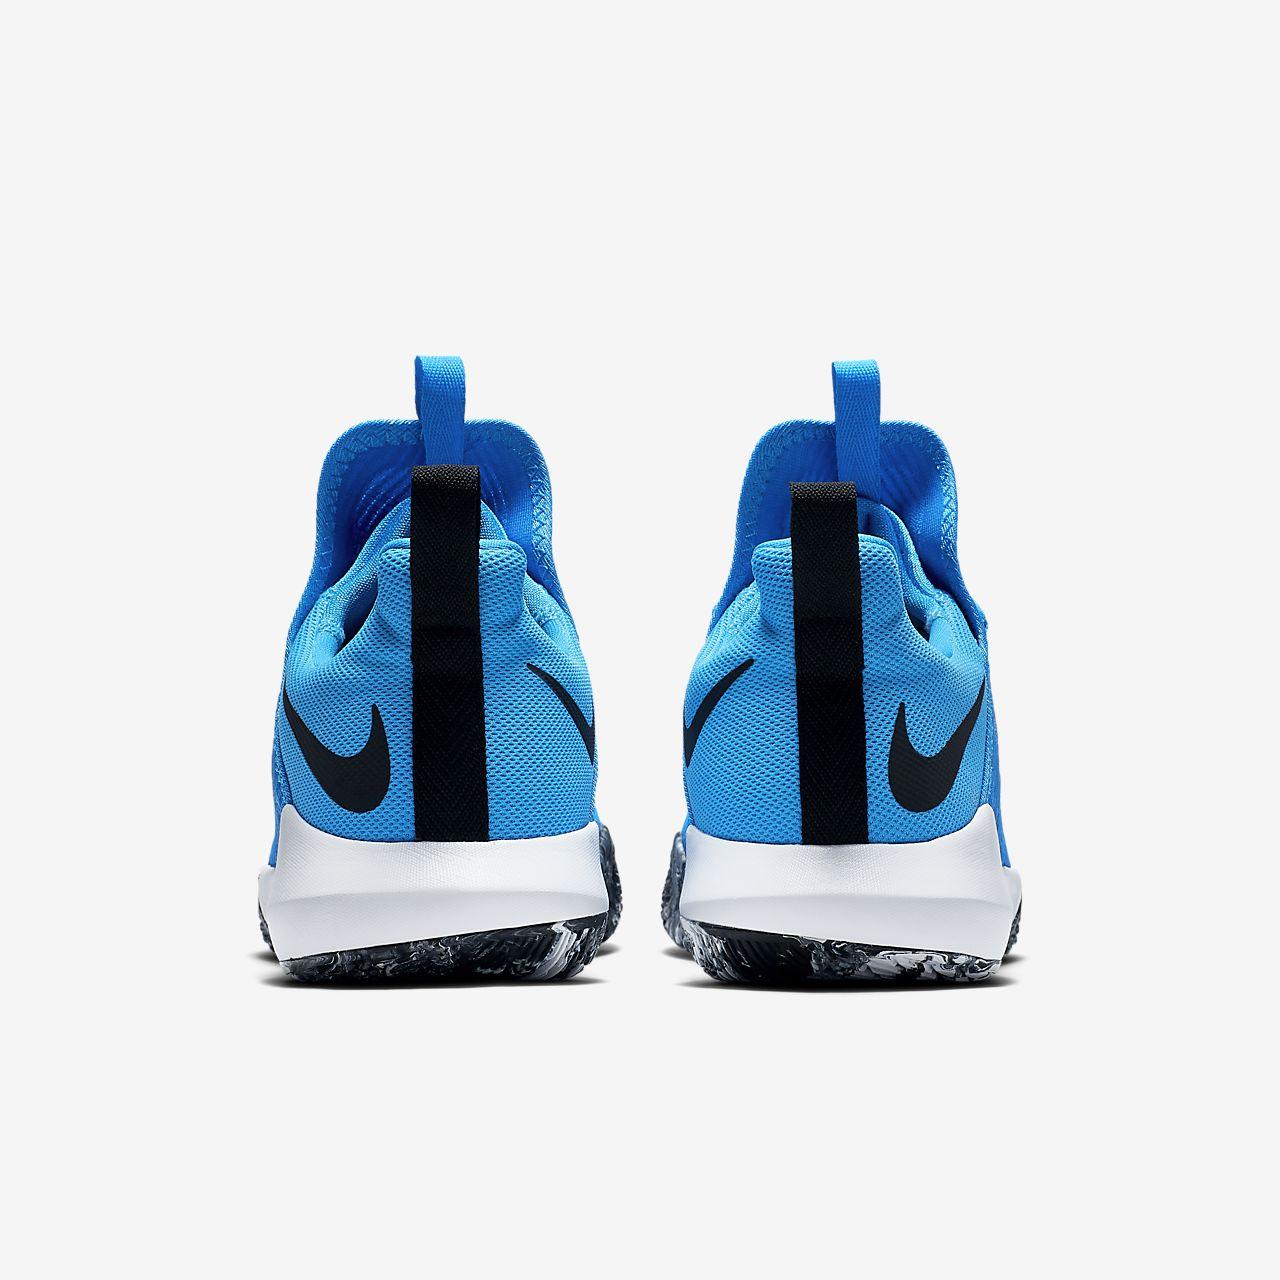 8bc0f30dd8a Nike Zoom Shift 2 Men s Basketball Shoe. Nike.com ID